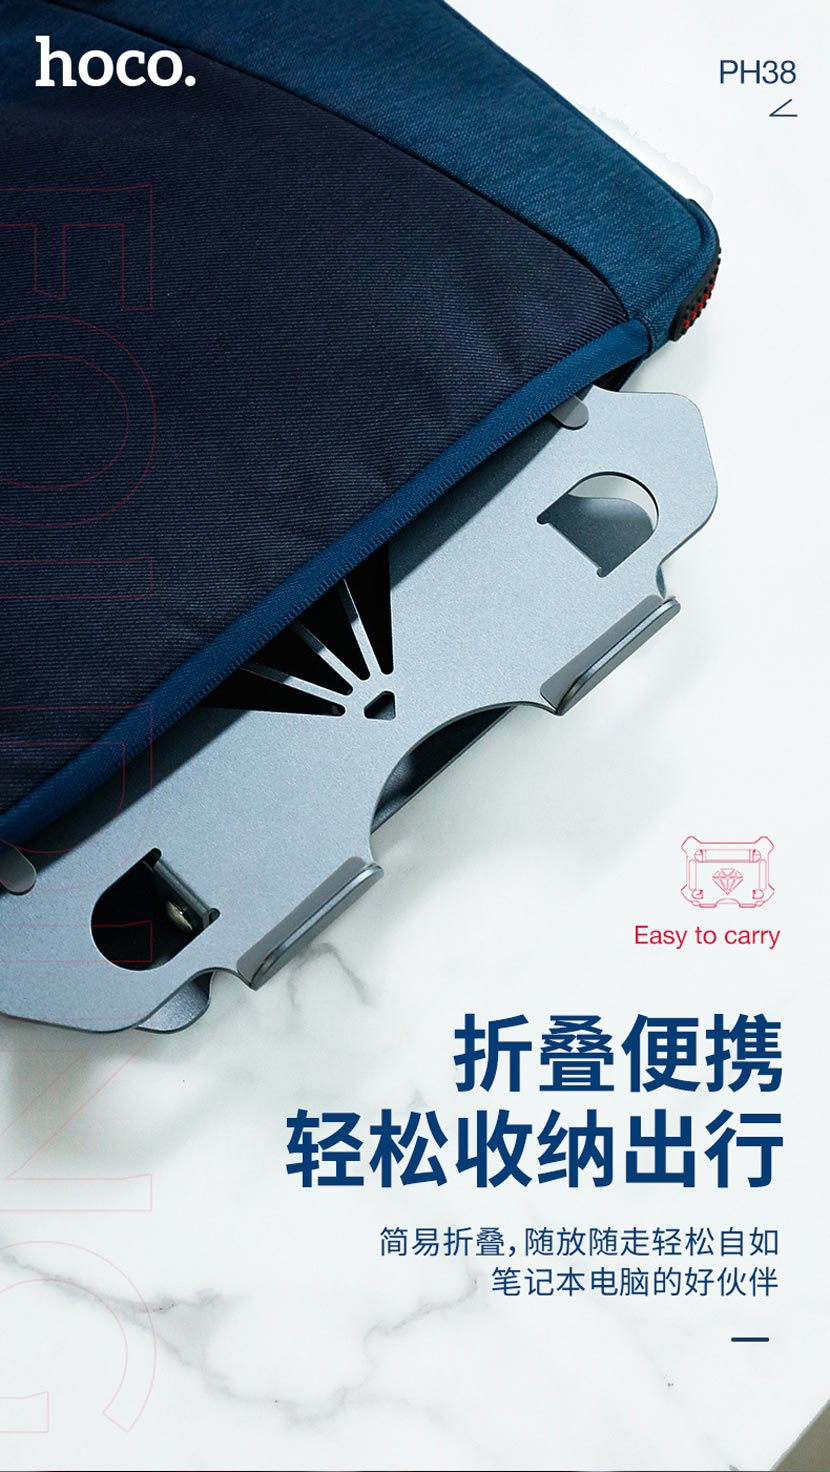 hoco ph38 diamond aluminum alloy folding laptop stand portable cn